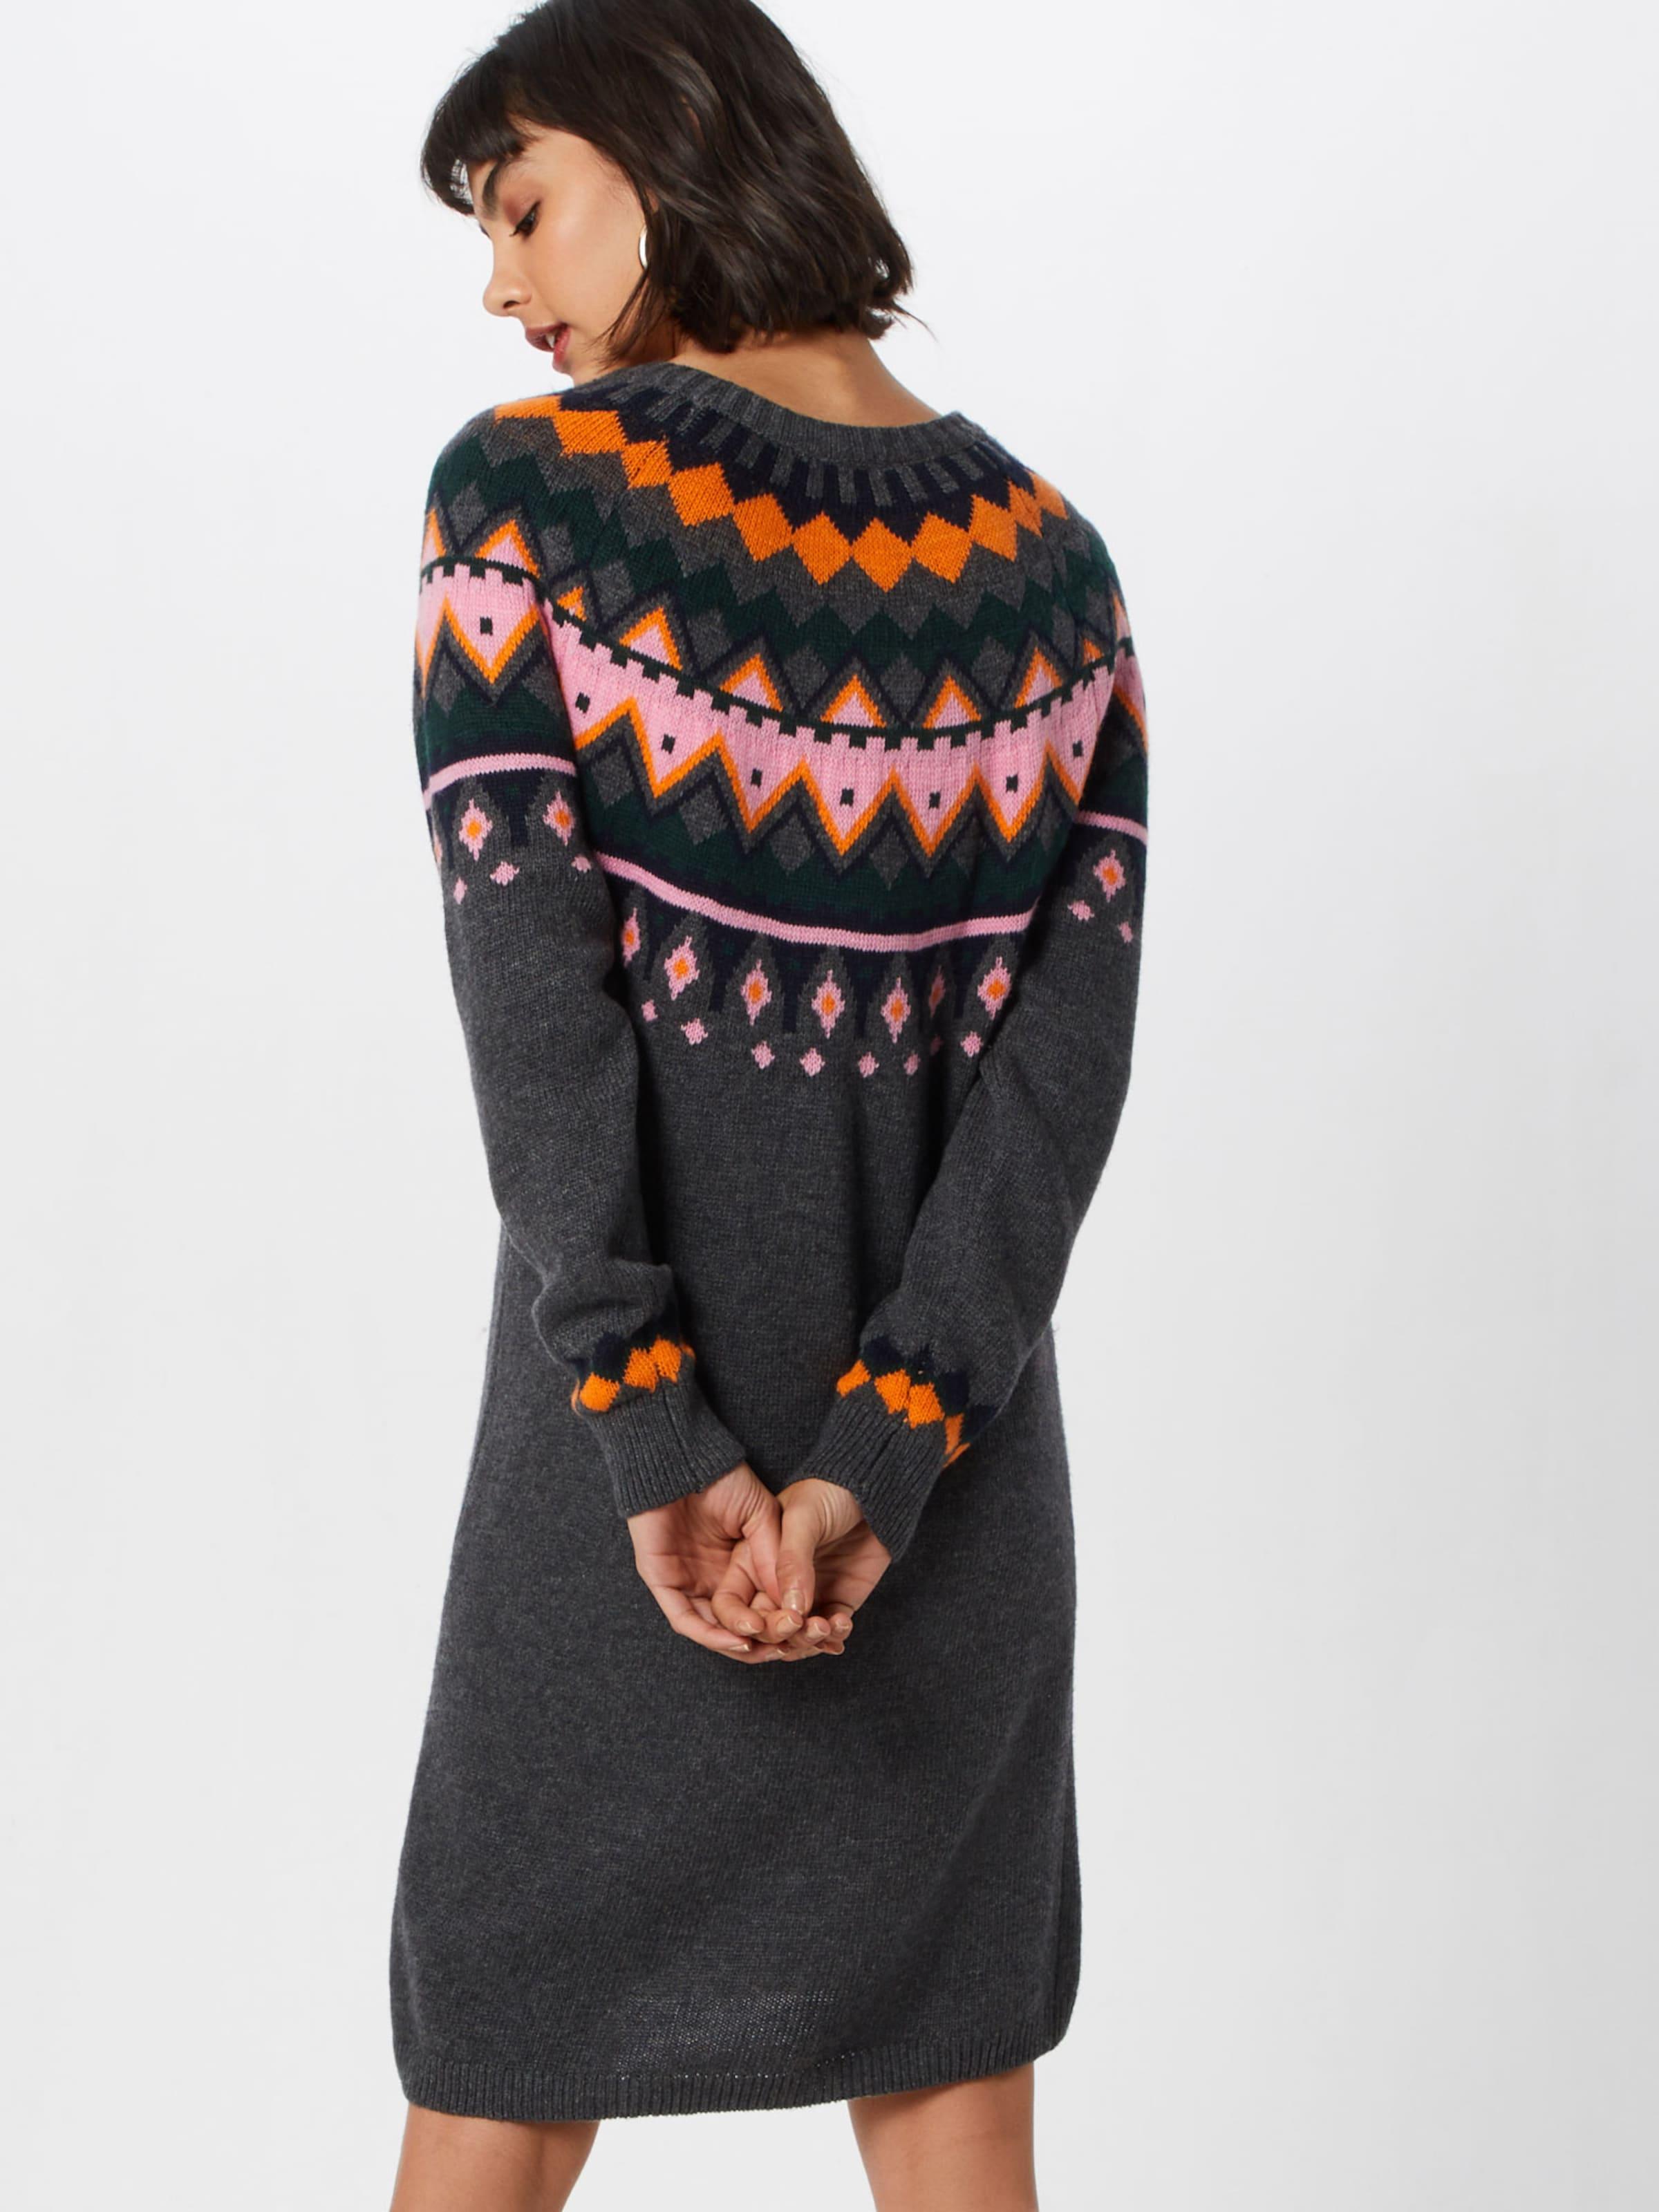 'nmlund Robe s De Couleurs Dress' O GrisMélange L En May Noisy Knit neck oCdtQBsrxh